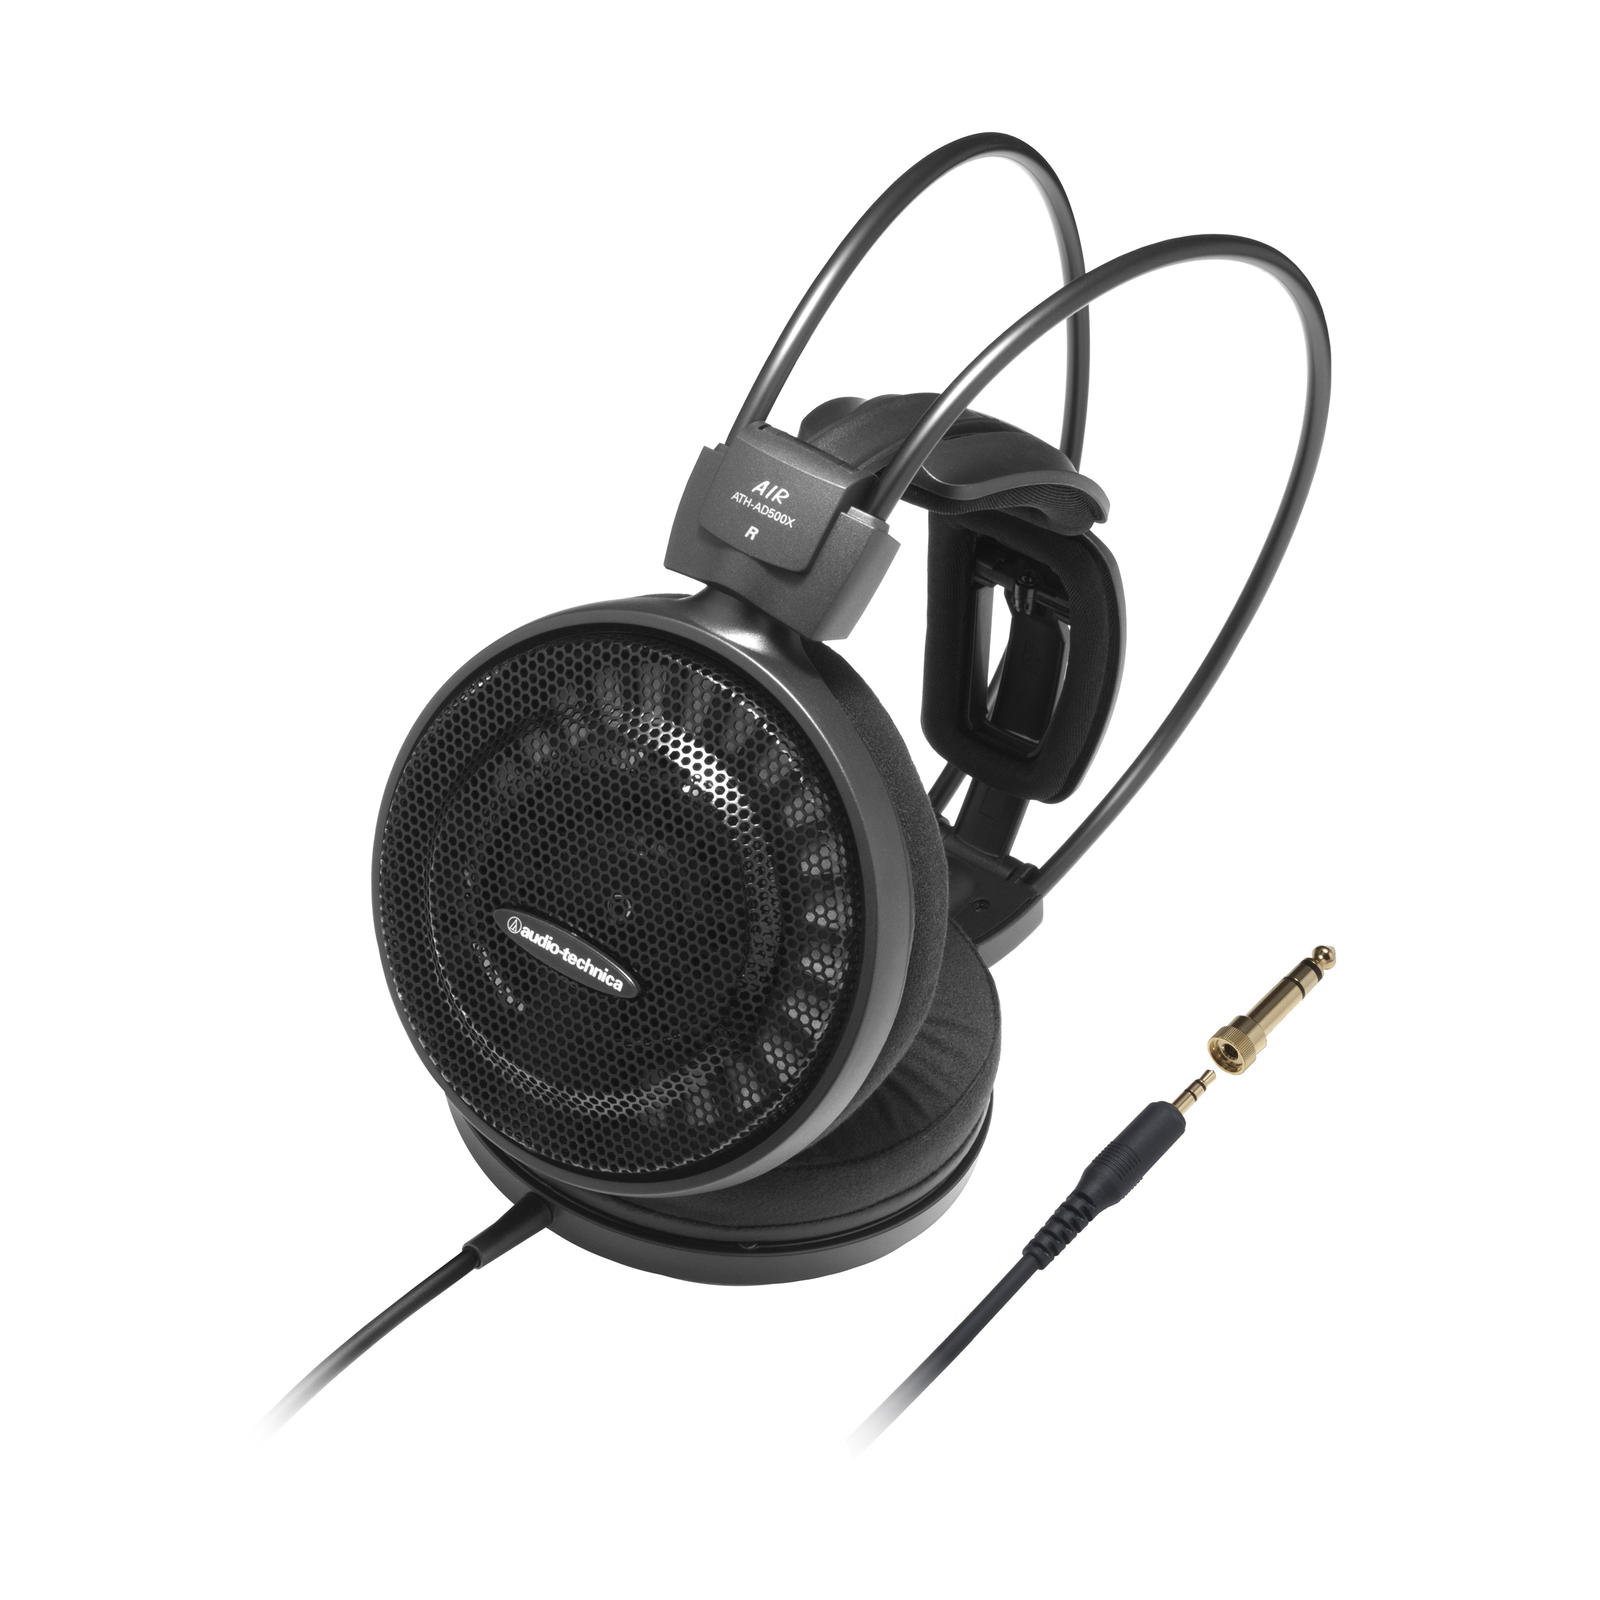 Audio-Technica ATH-AD500X Dynamic Open Air Headphones image